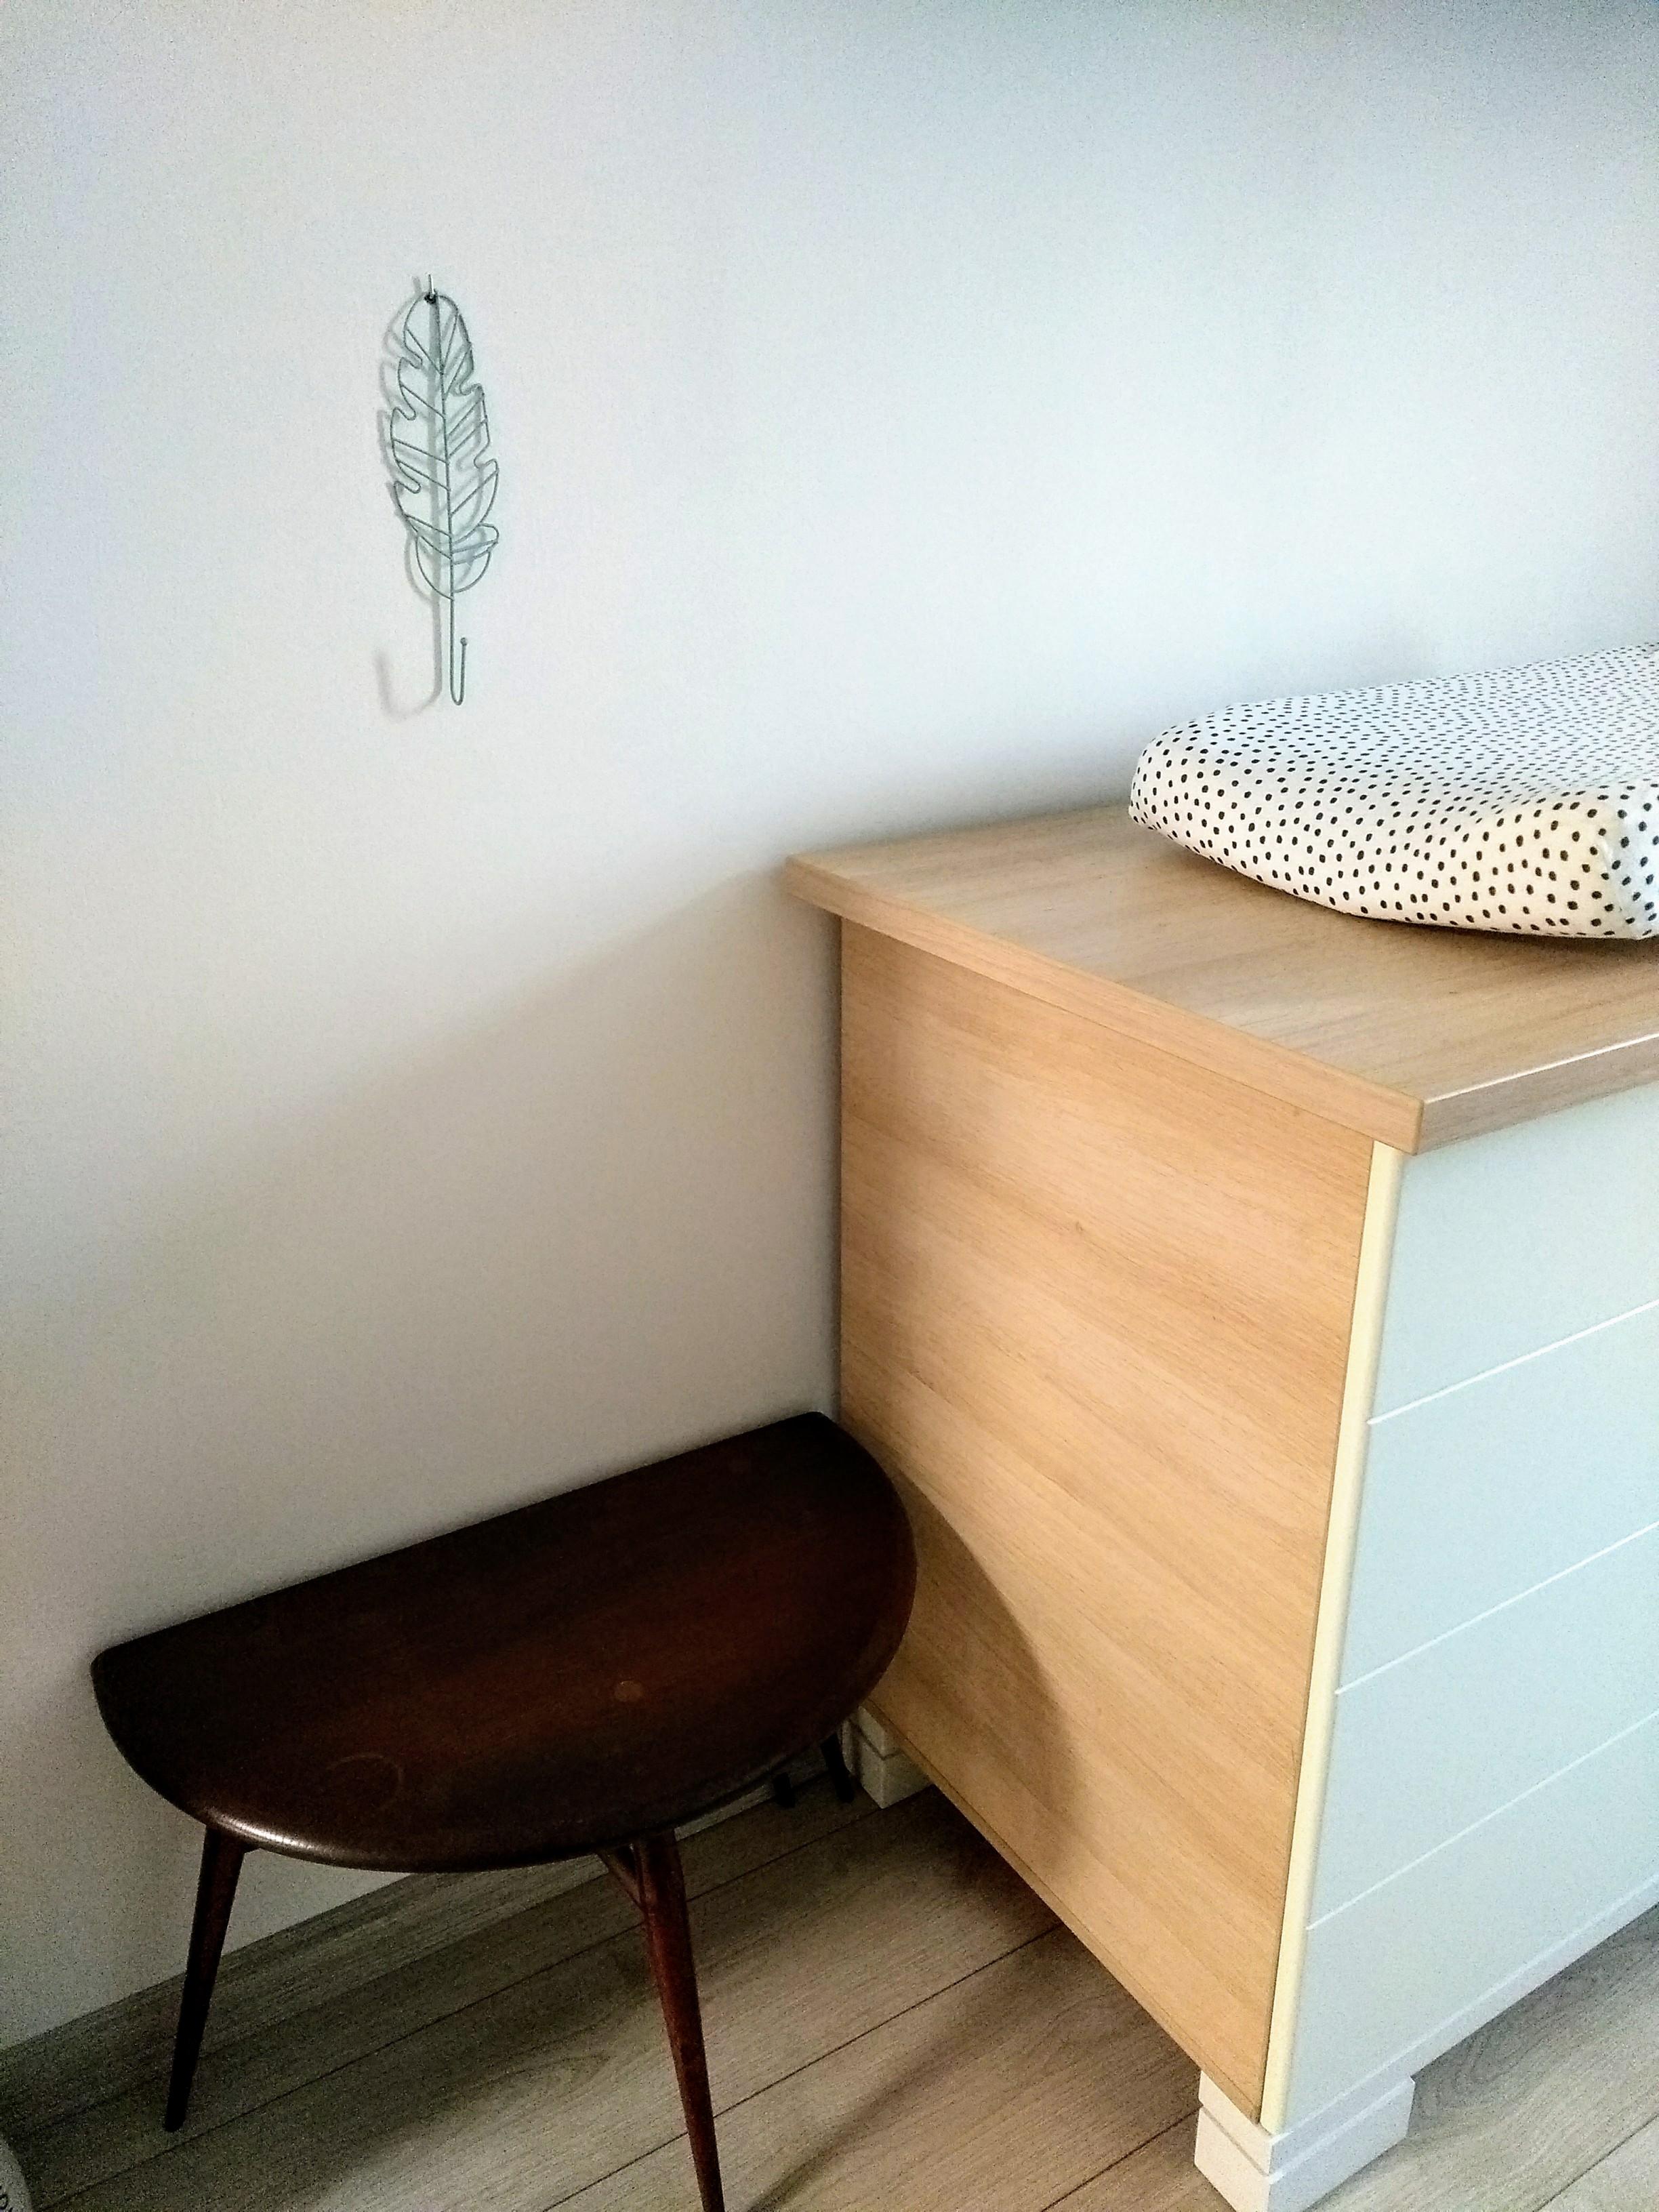 interieur, kinderkamer, kinderkamers, nieuwe kamers, klussen, verbouwen, mamablog, babykamer, mamalifestyle, lalog.nl